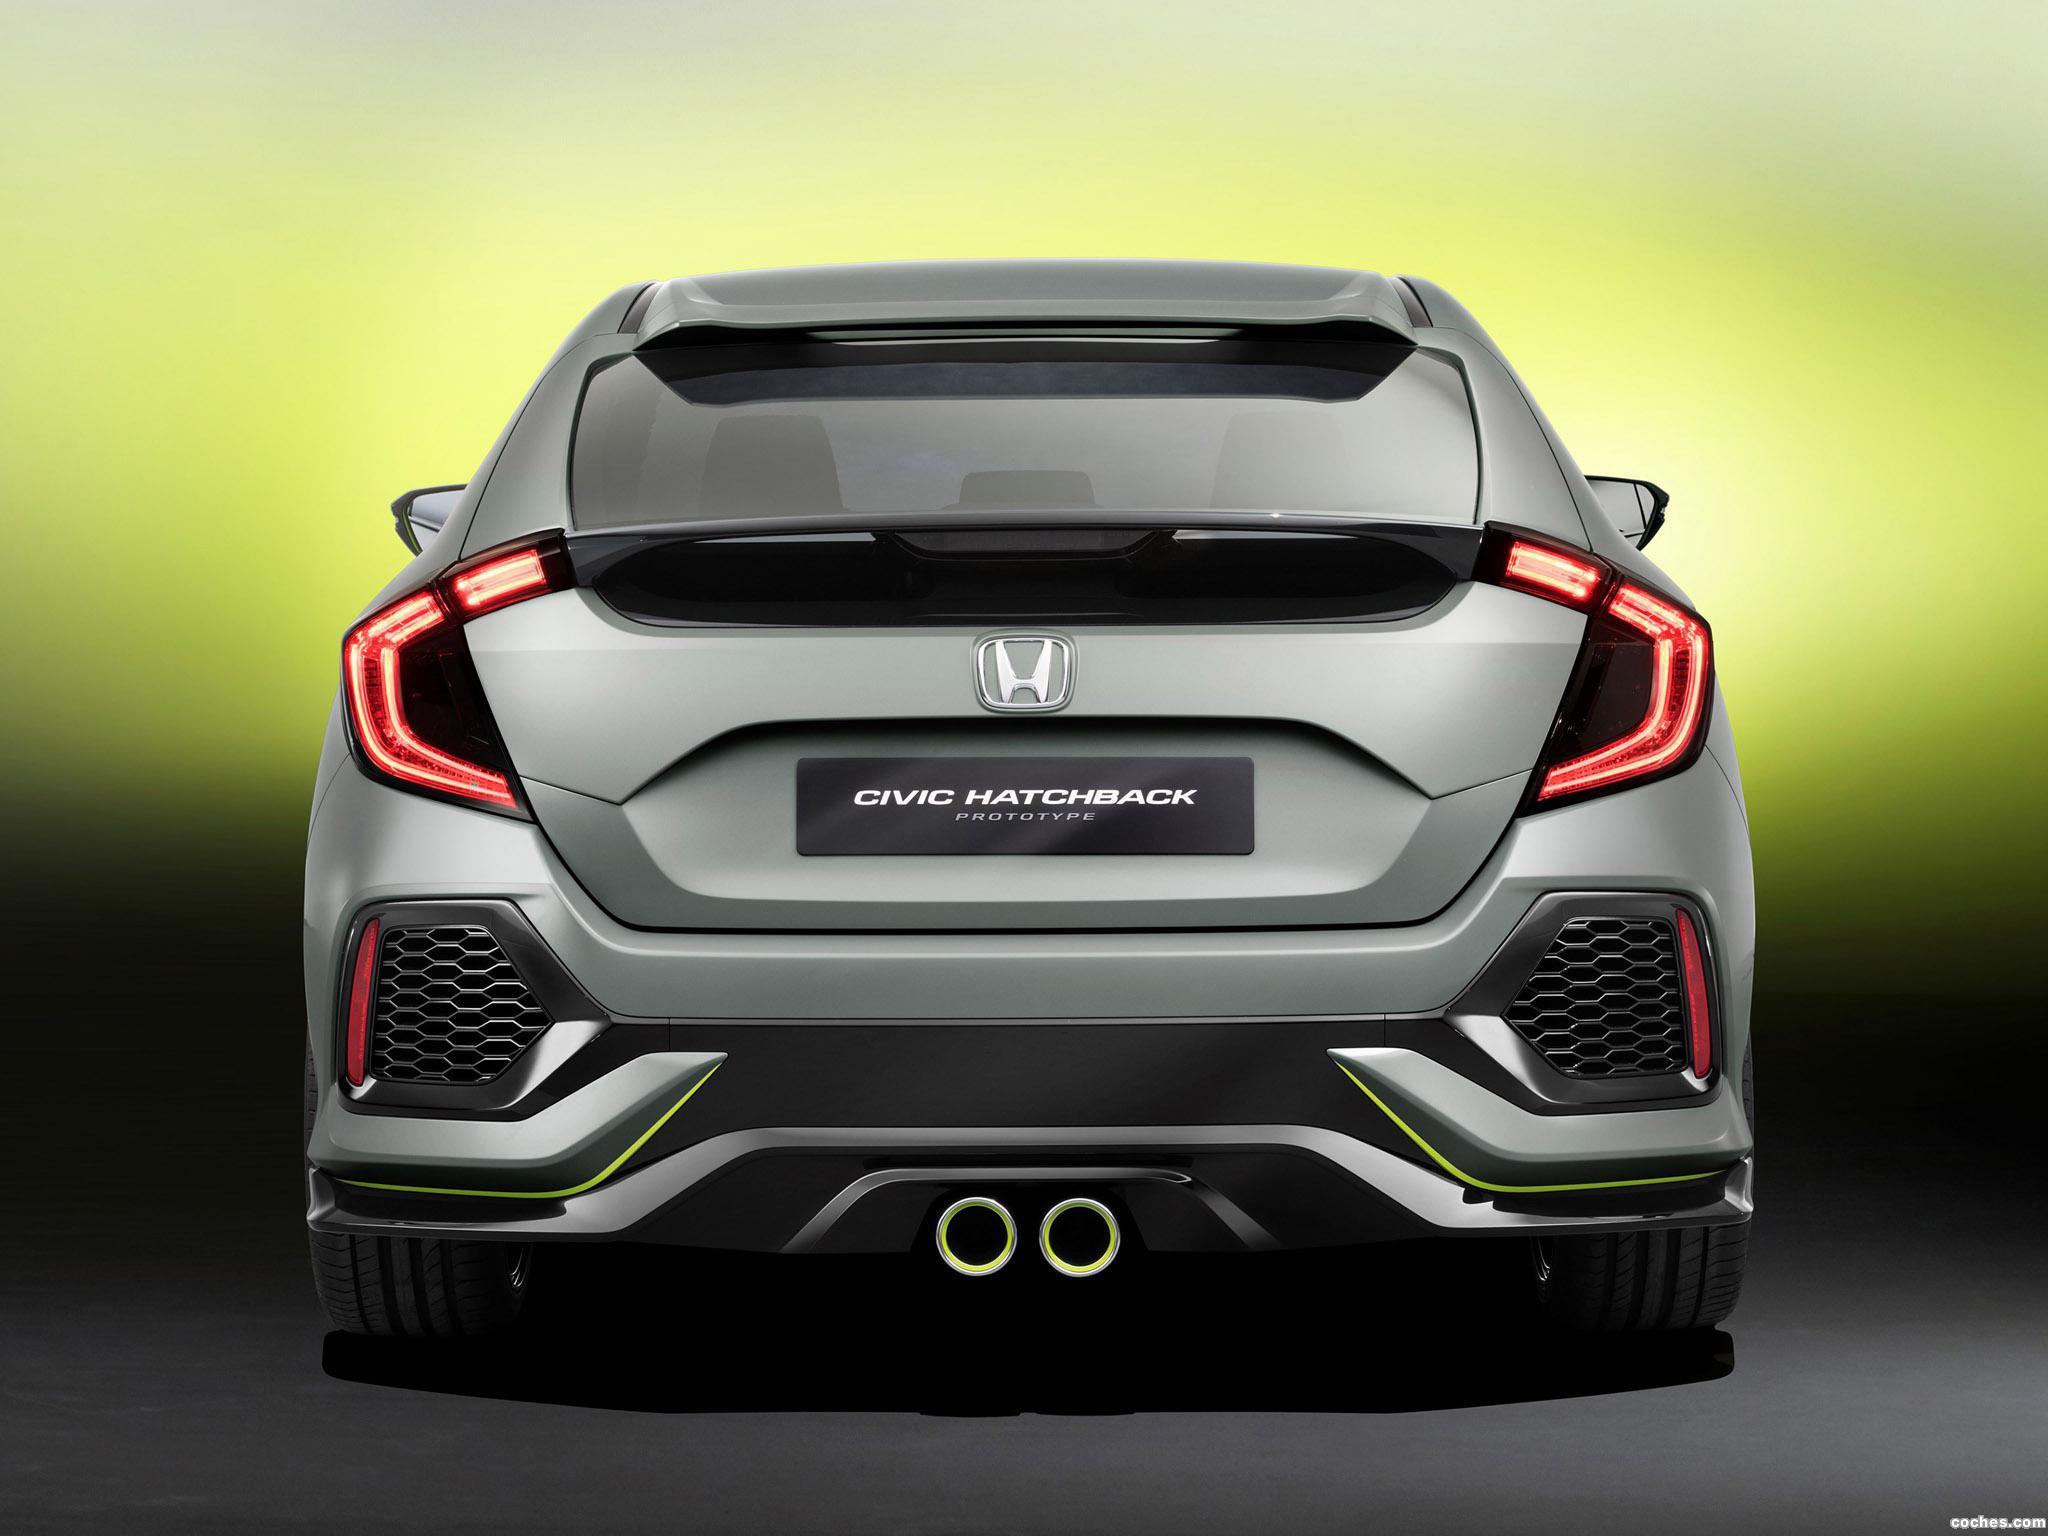 Foto 1 de Honda Civic Hatchback Concept 2016